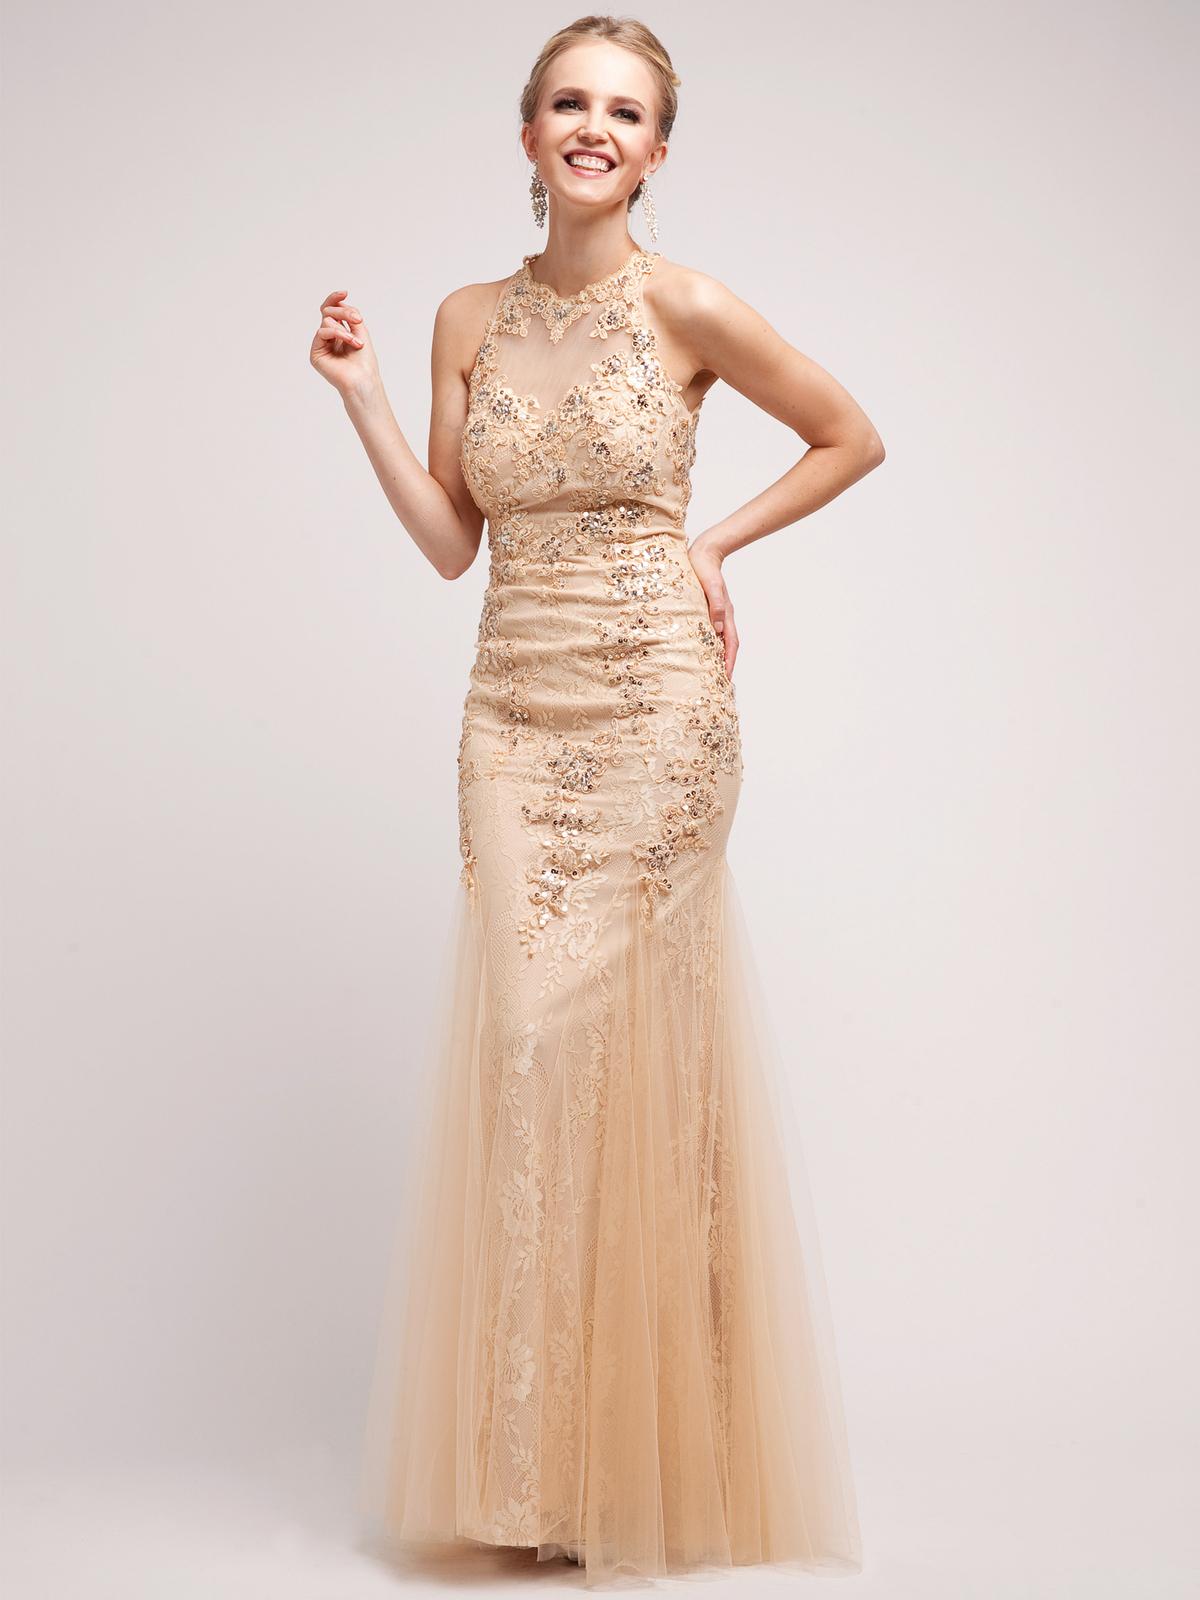 Vintage-Inspired Gold Halter Evening Dress  Sung Boutique L.A.